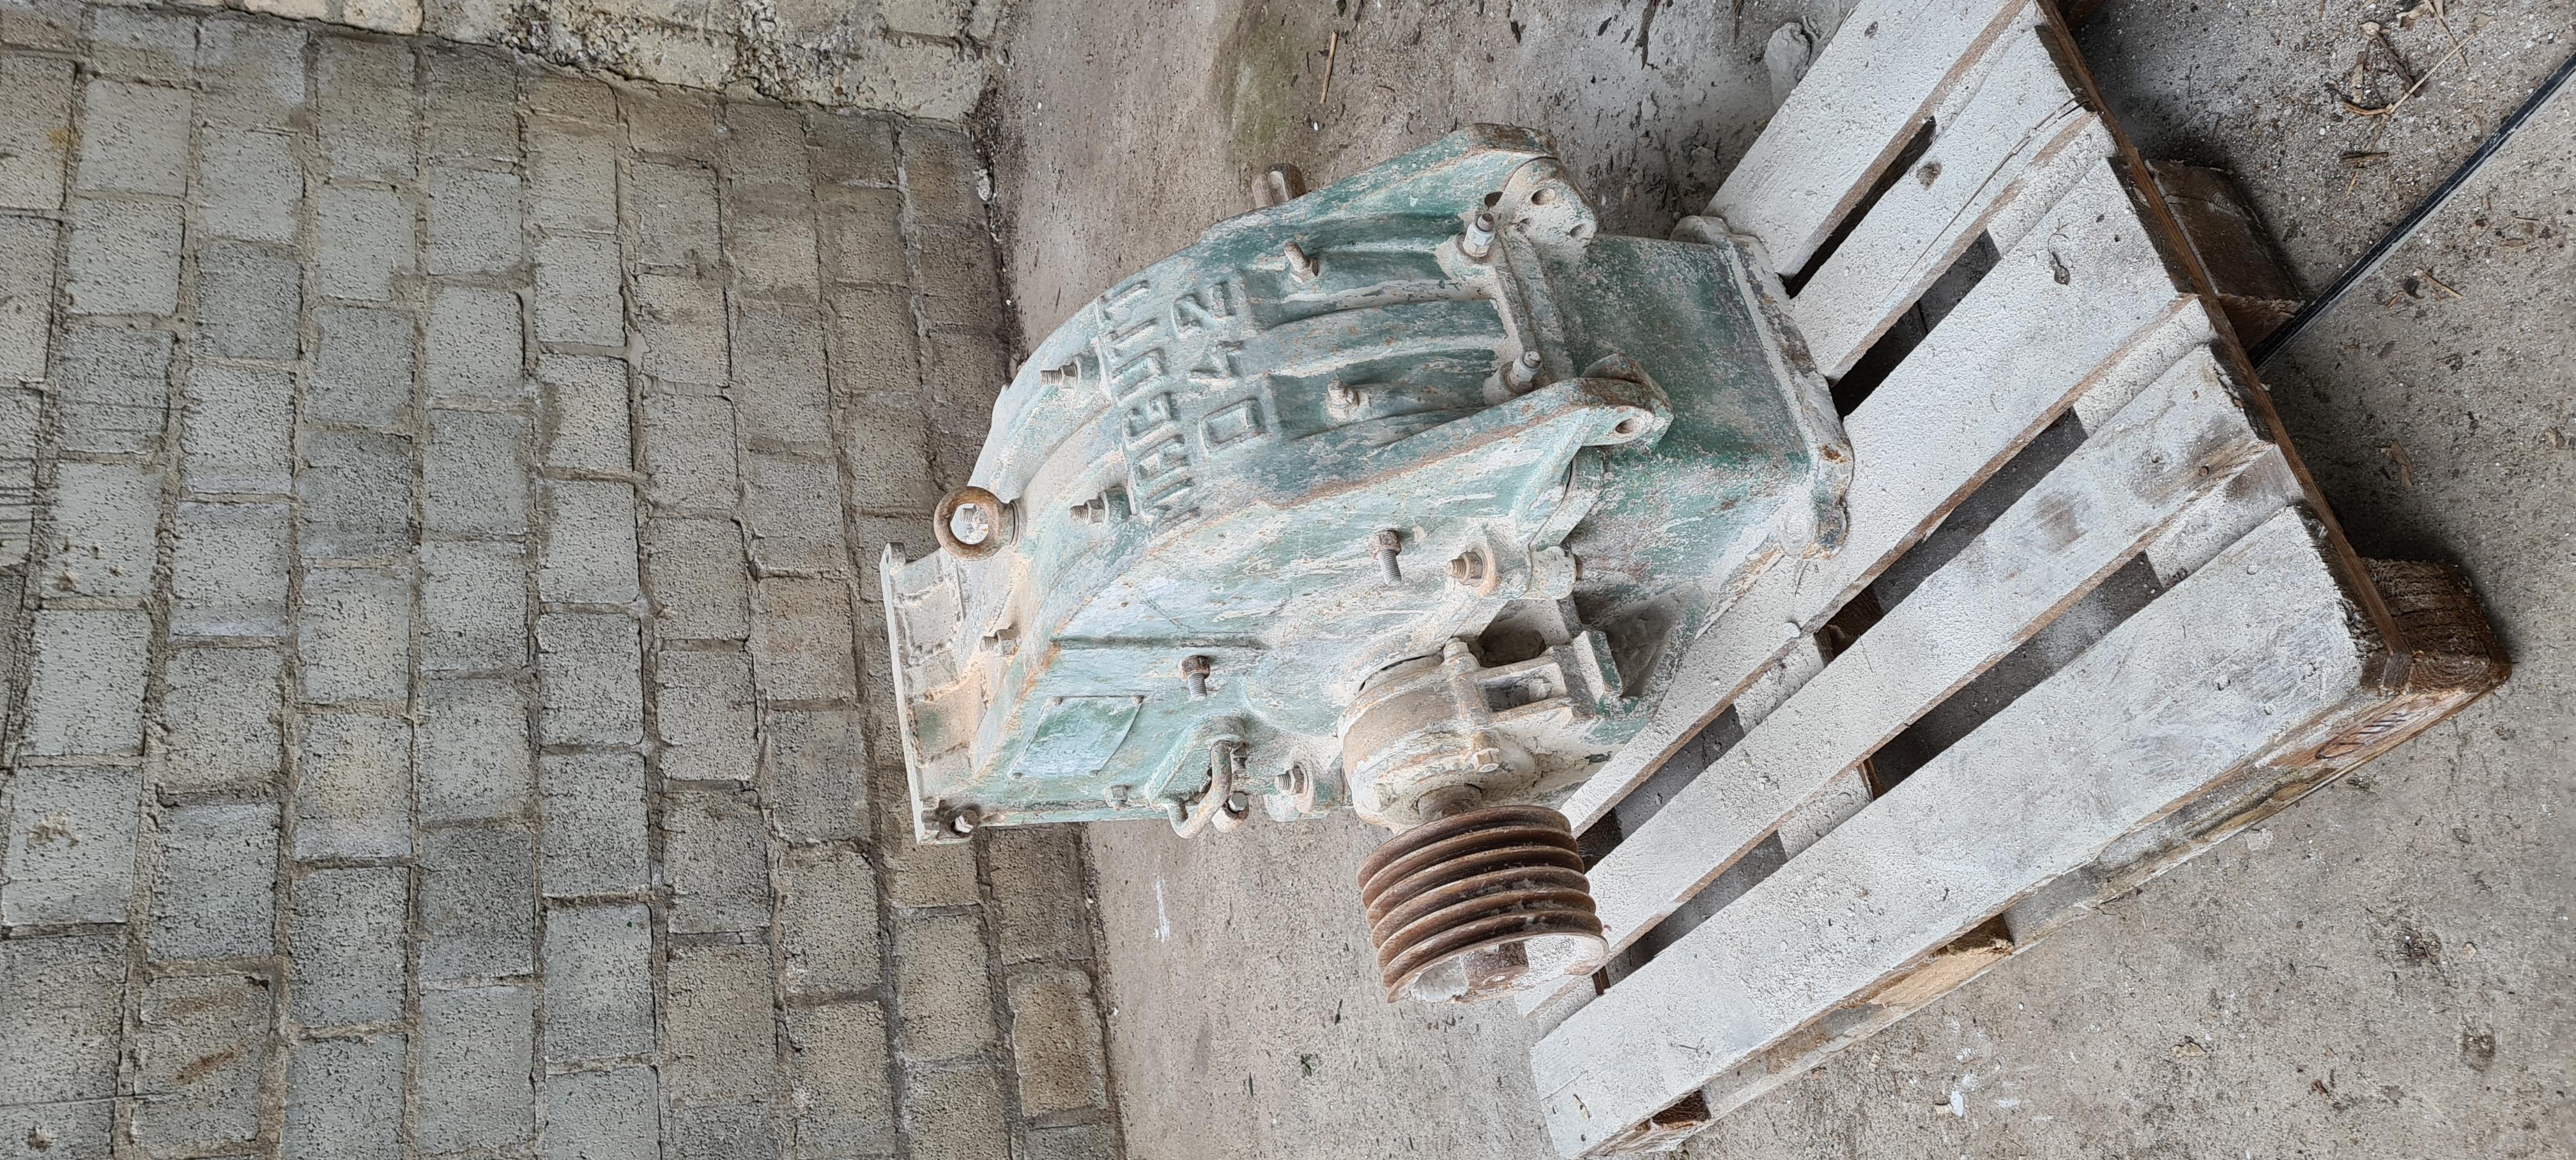 Mulino Loro&parisini 042 in vendita - foto 1